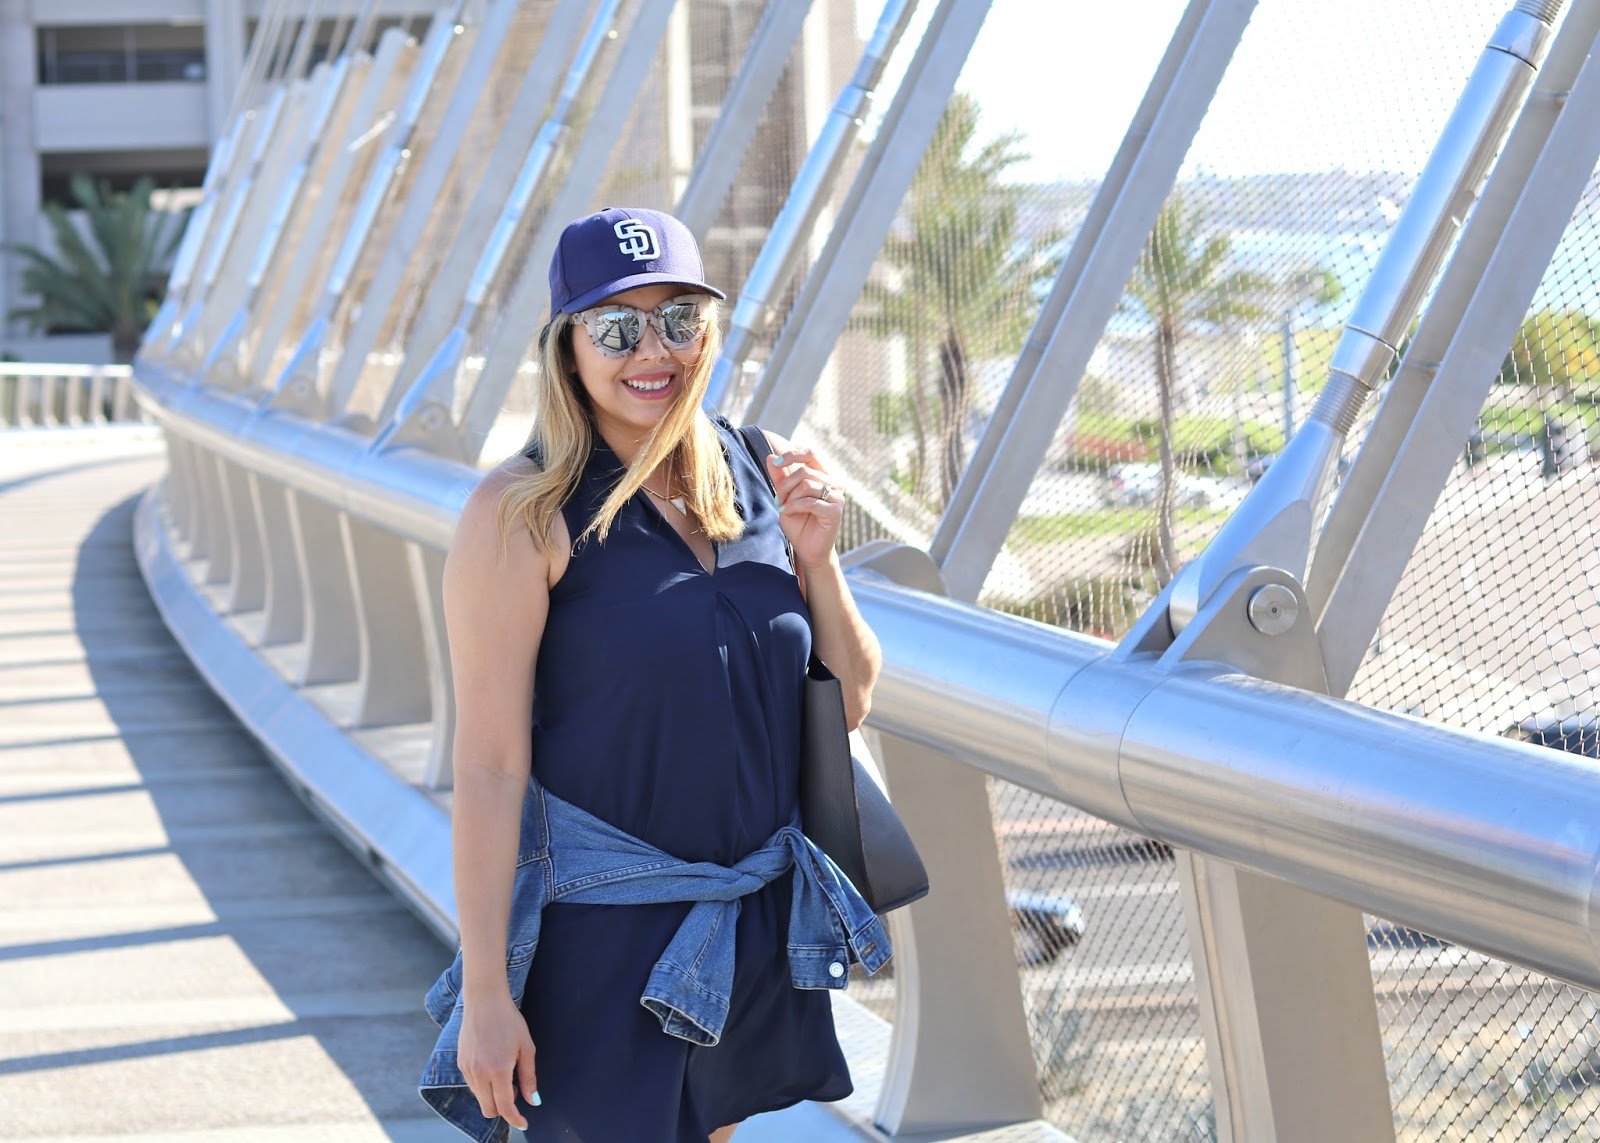 San Diego fashion blogger, San diego lifestyle blogger, san diego style blogger, style blogger in San Diego